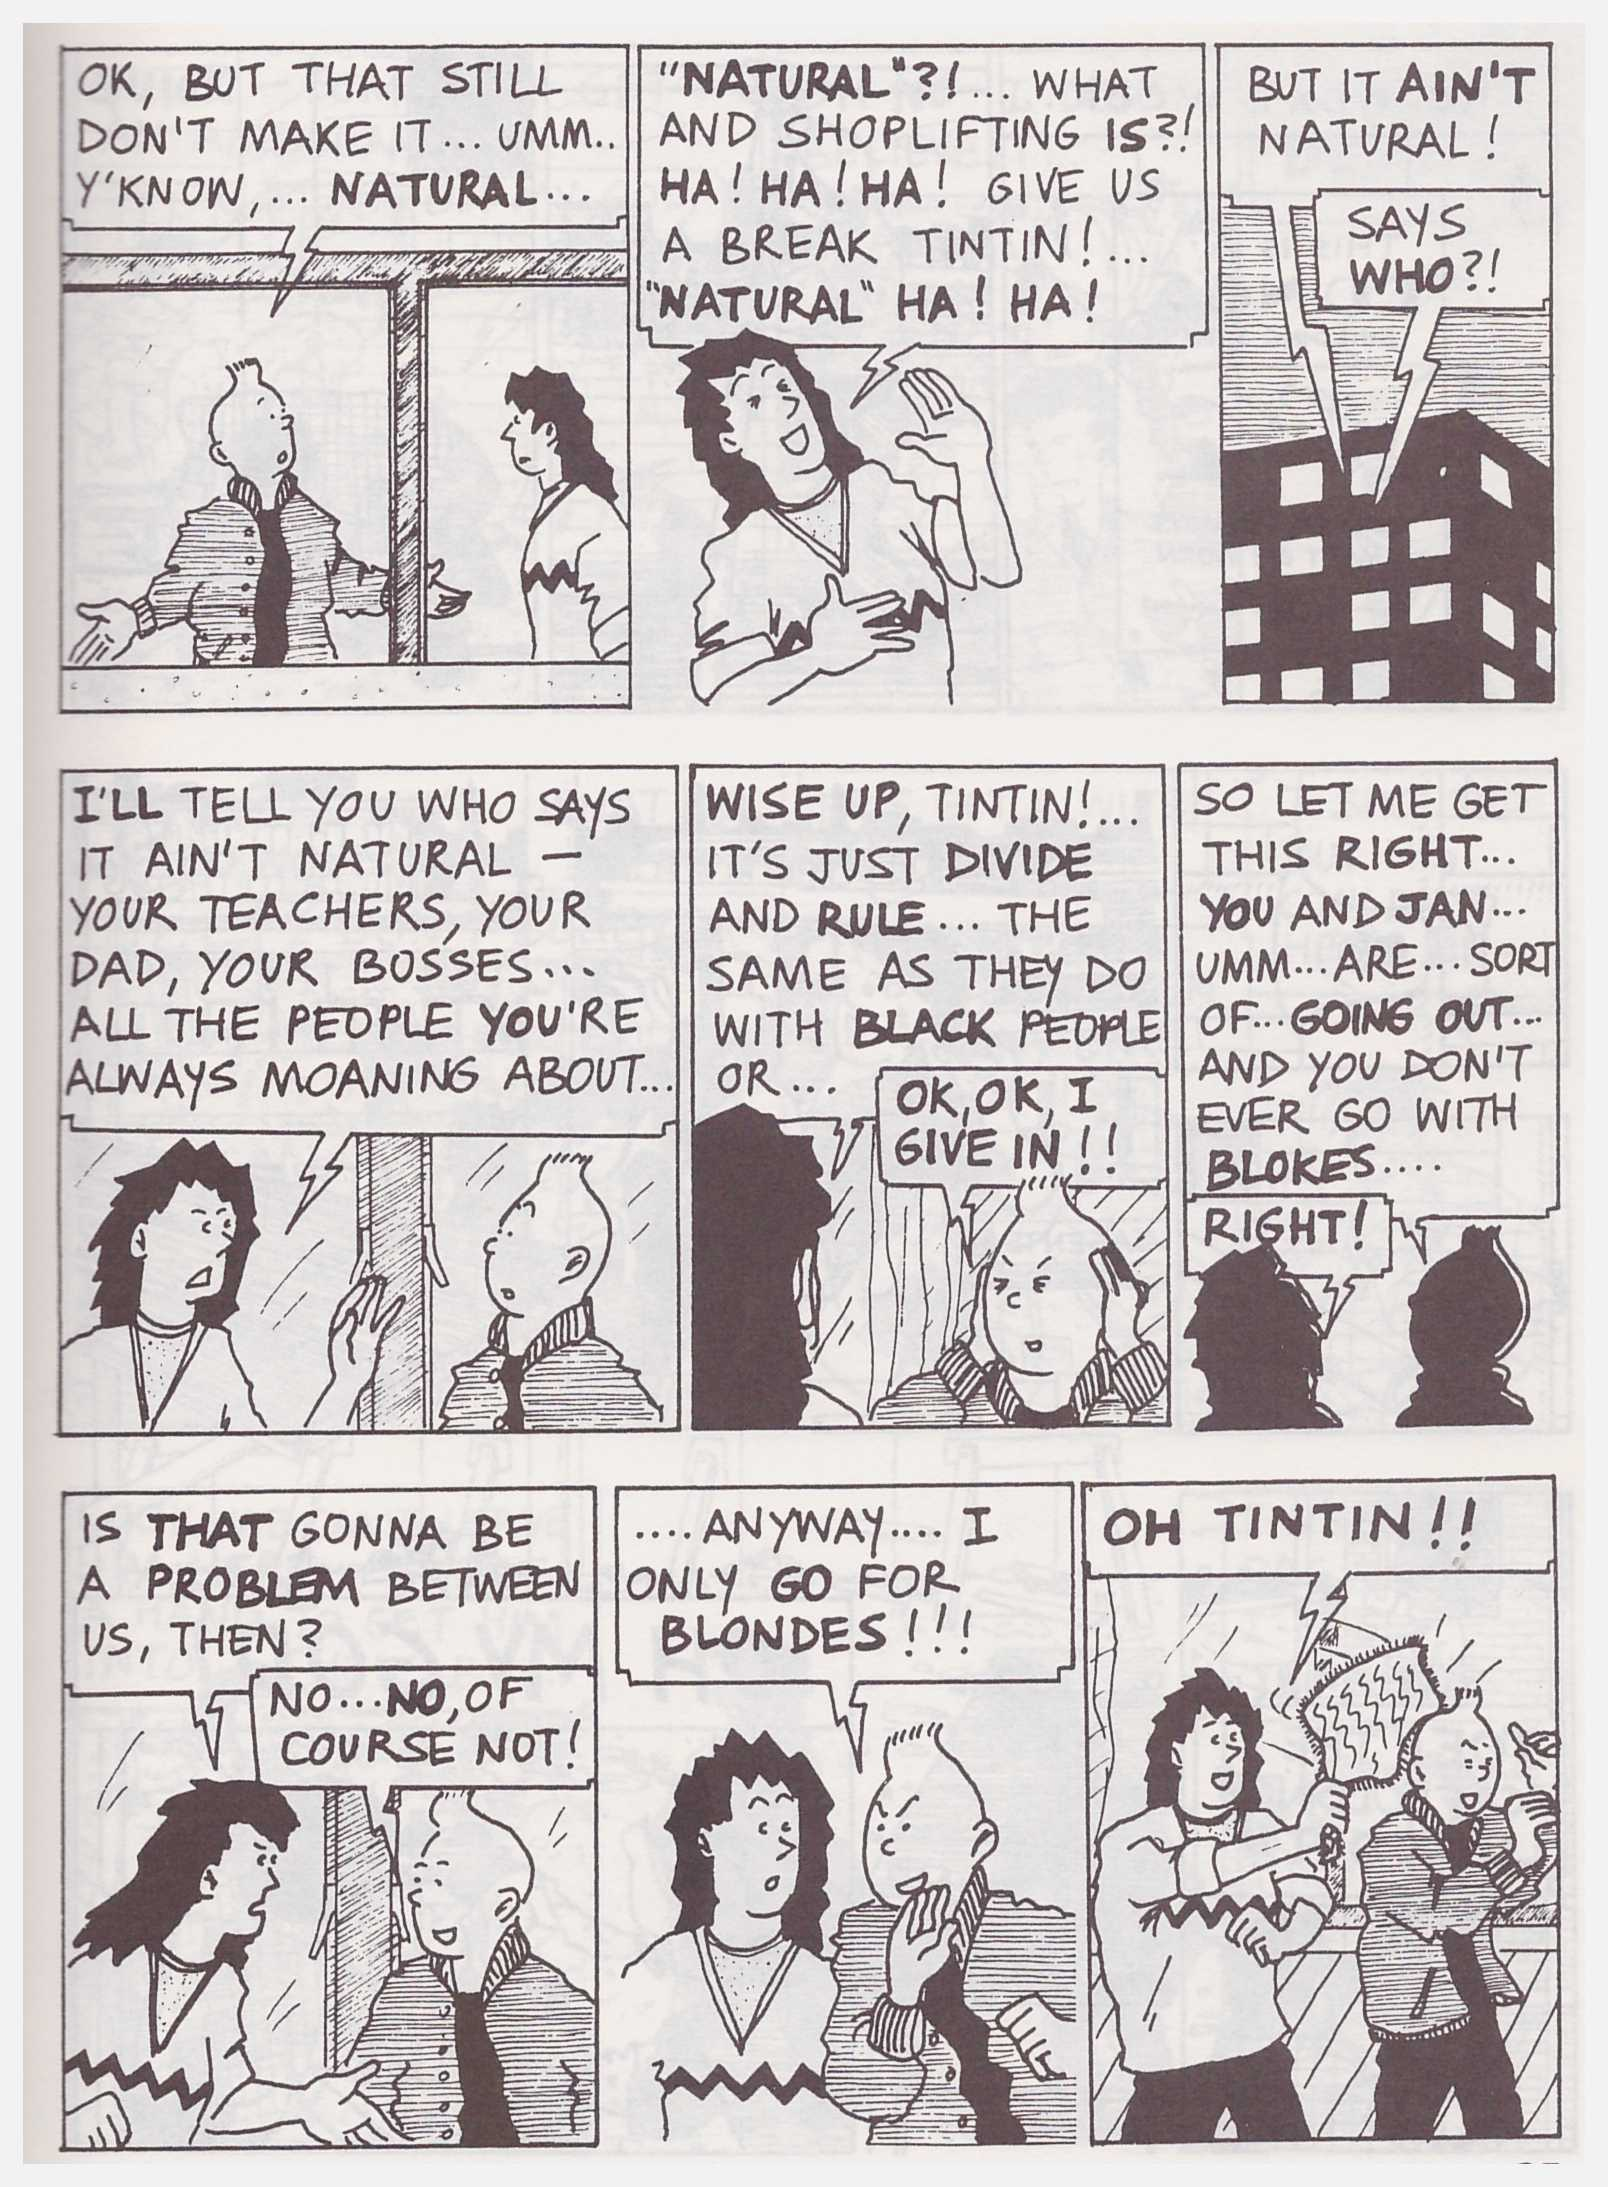 Tintin Breaking Free review